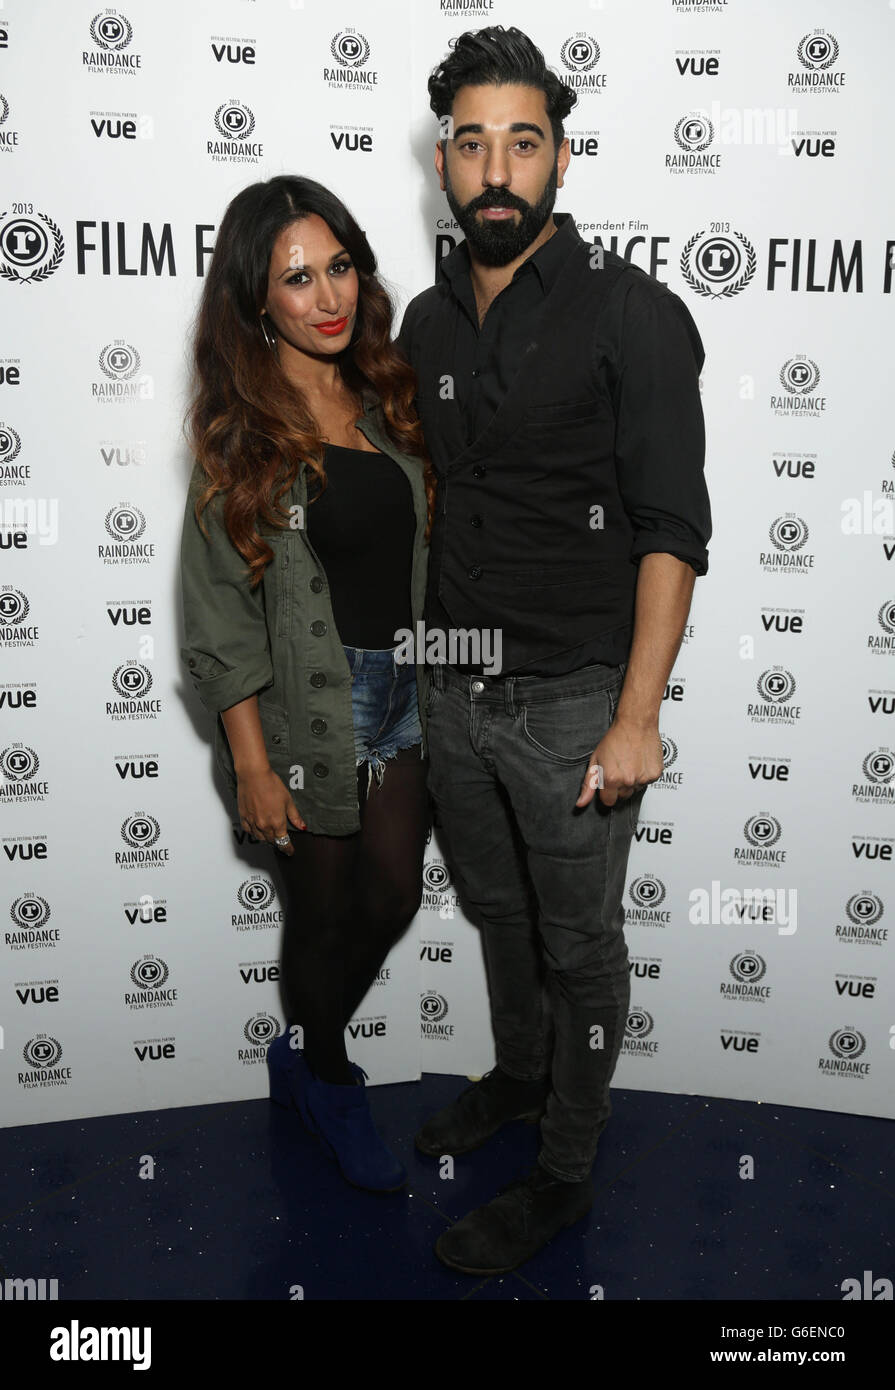 El Raindance Film Festival - Londres Foto de stock